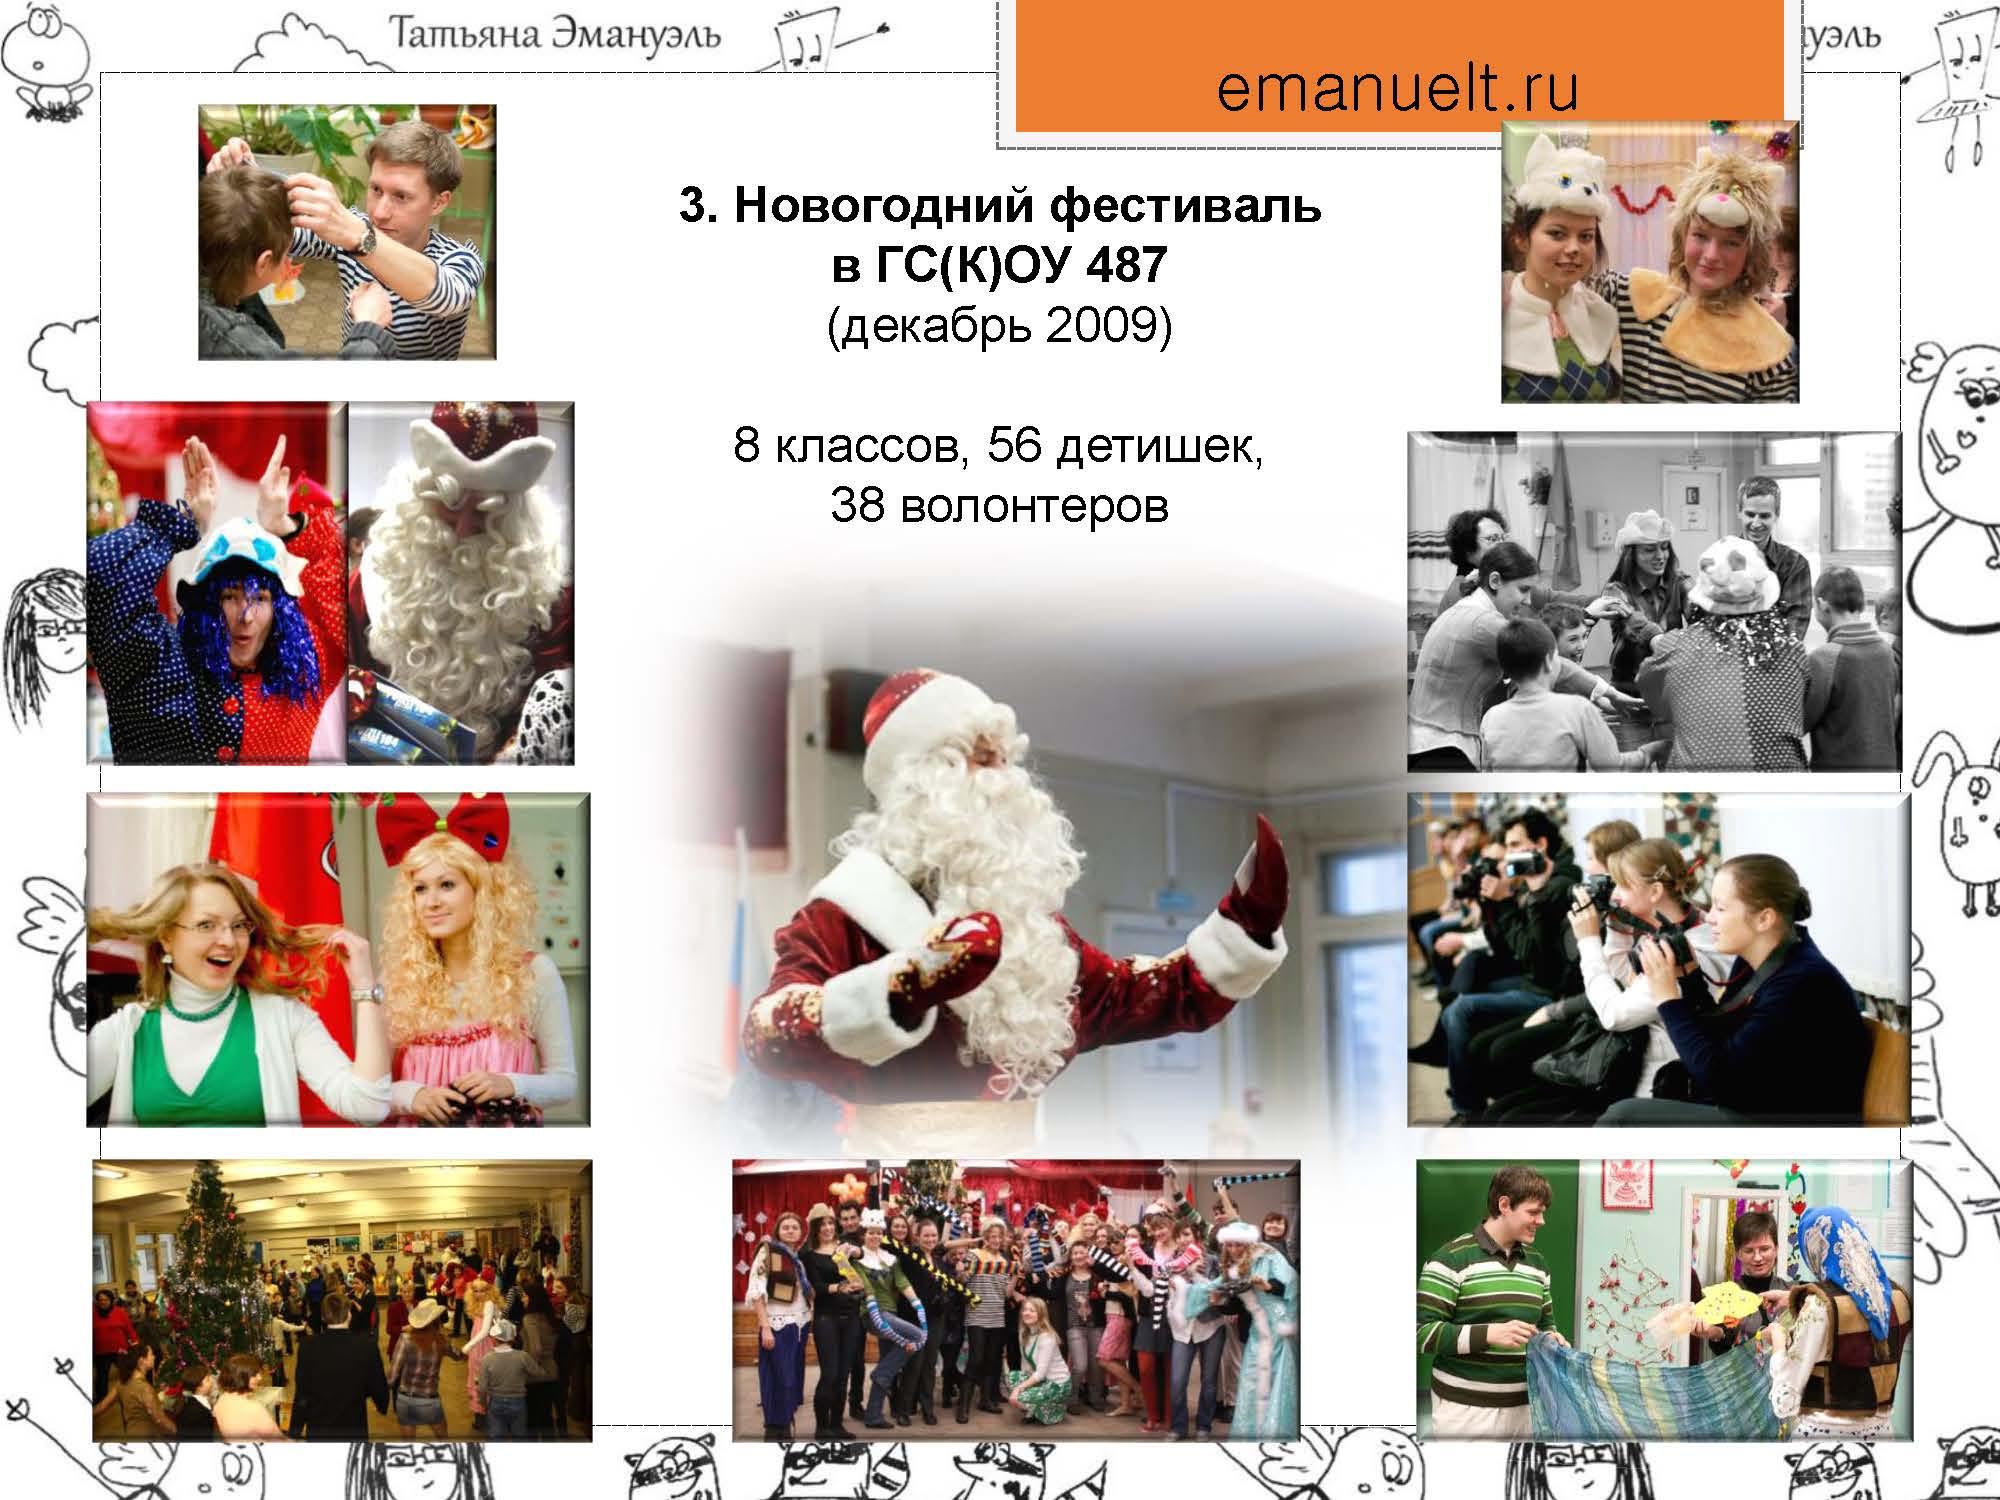 RazBeG_Emanuel_Страница_10